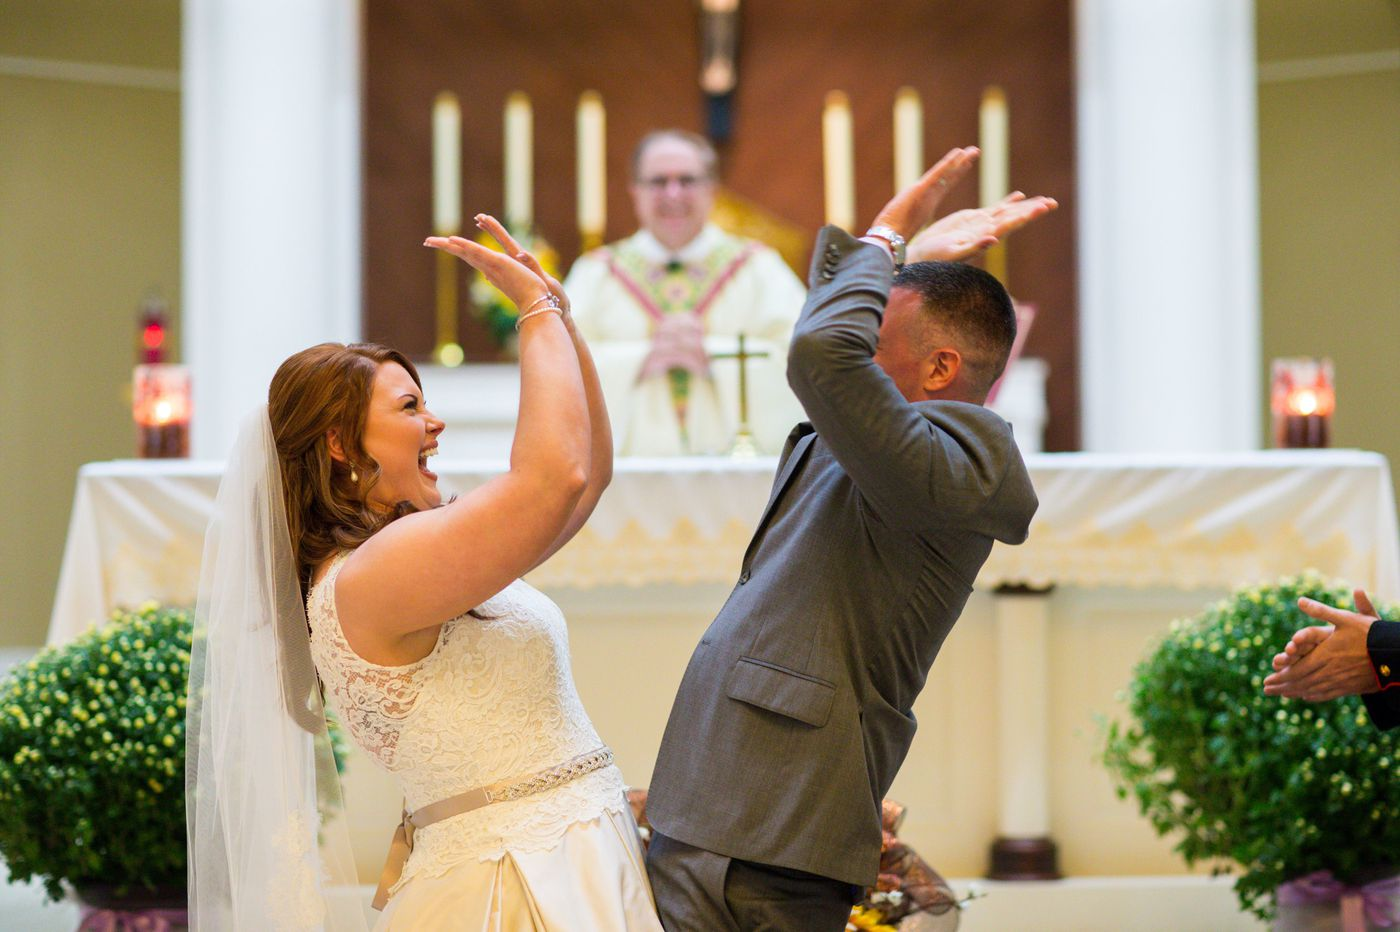 Philadelphia weddings: Courtney Hoffer and Joe McClernon